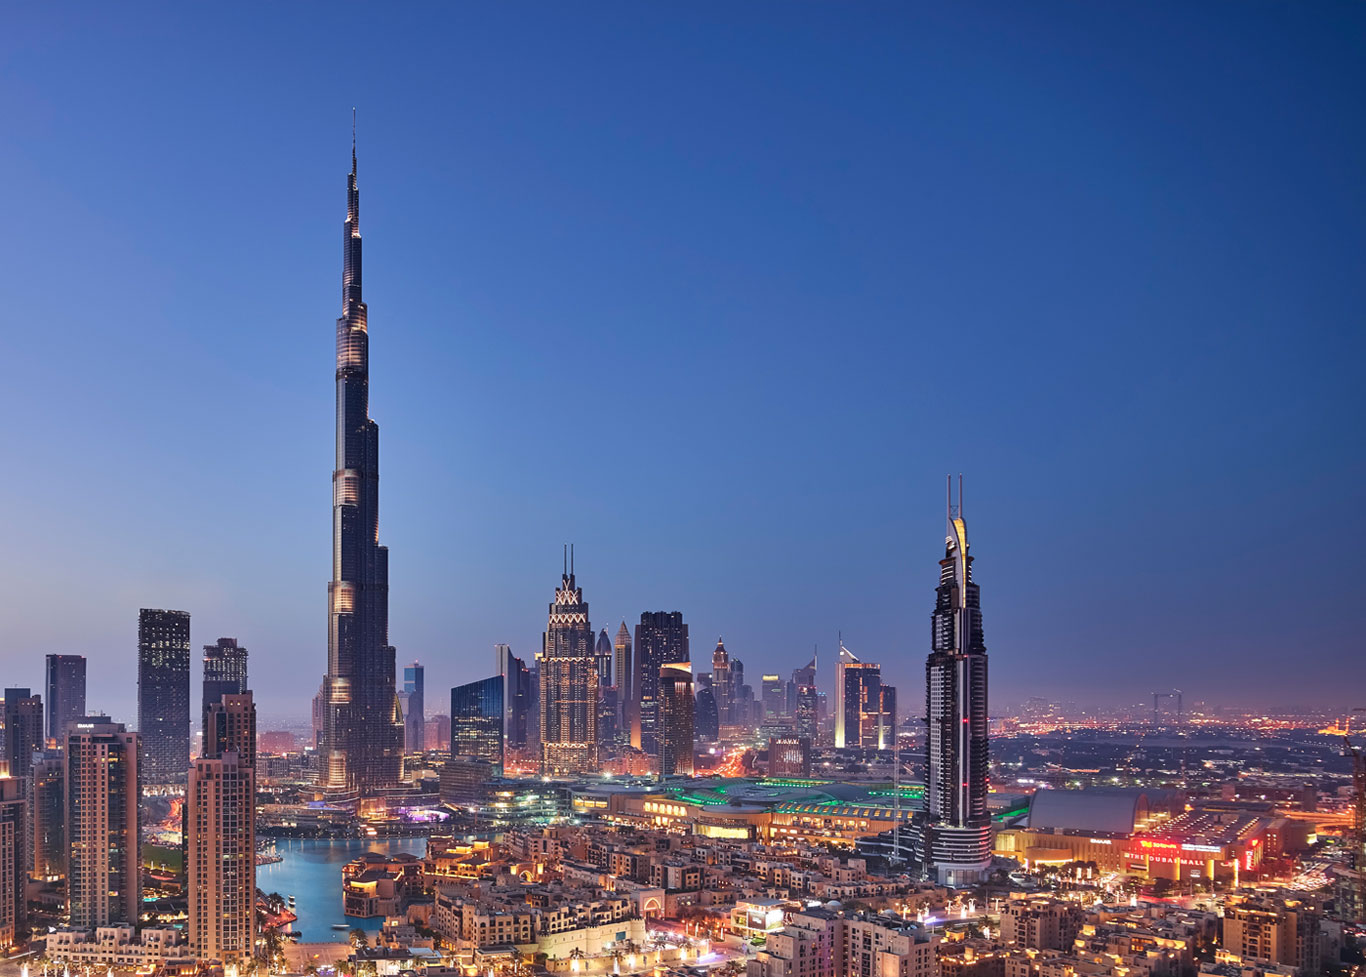 Buy Online & Book Now to Visit the Burj Khalifa | Burj Khalifa